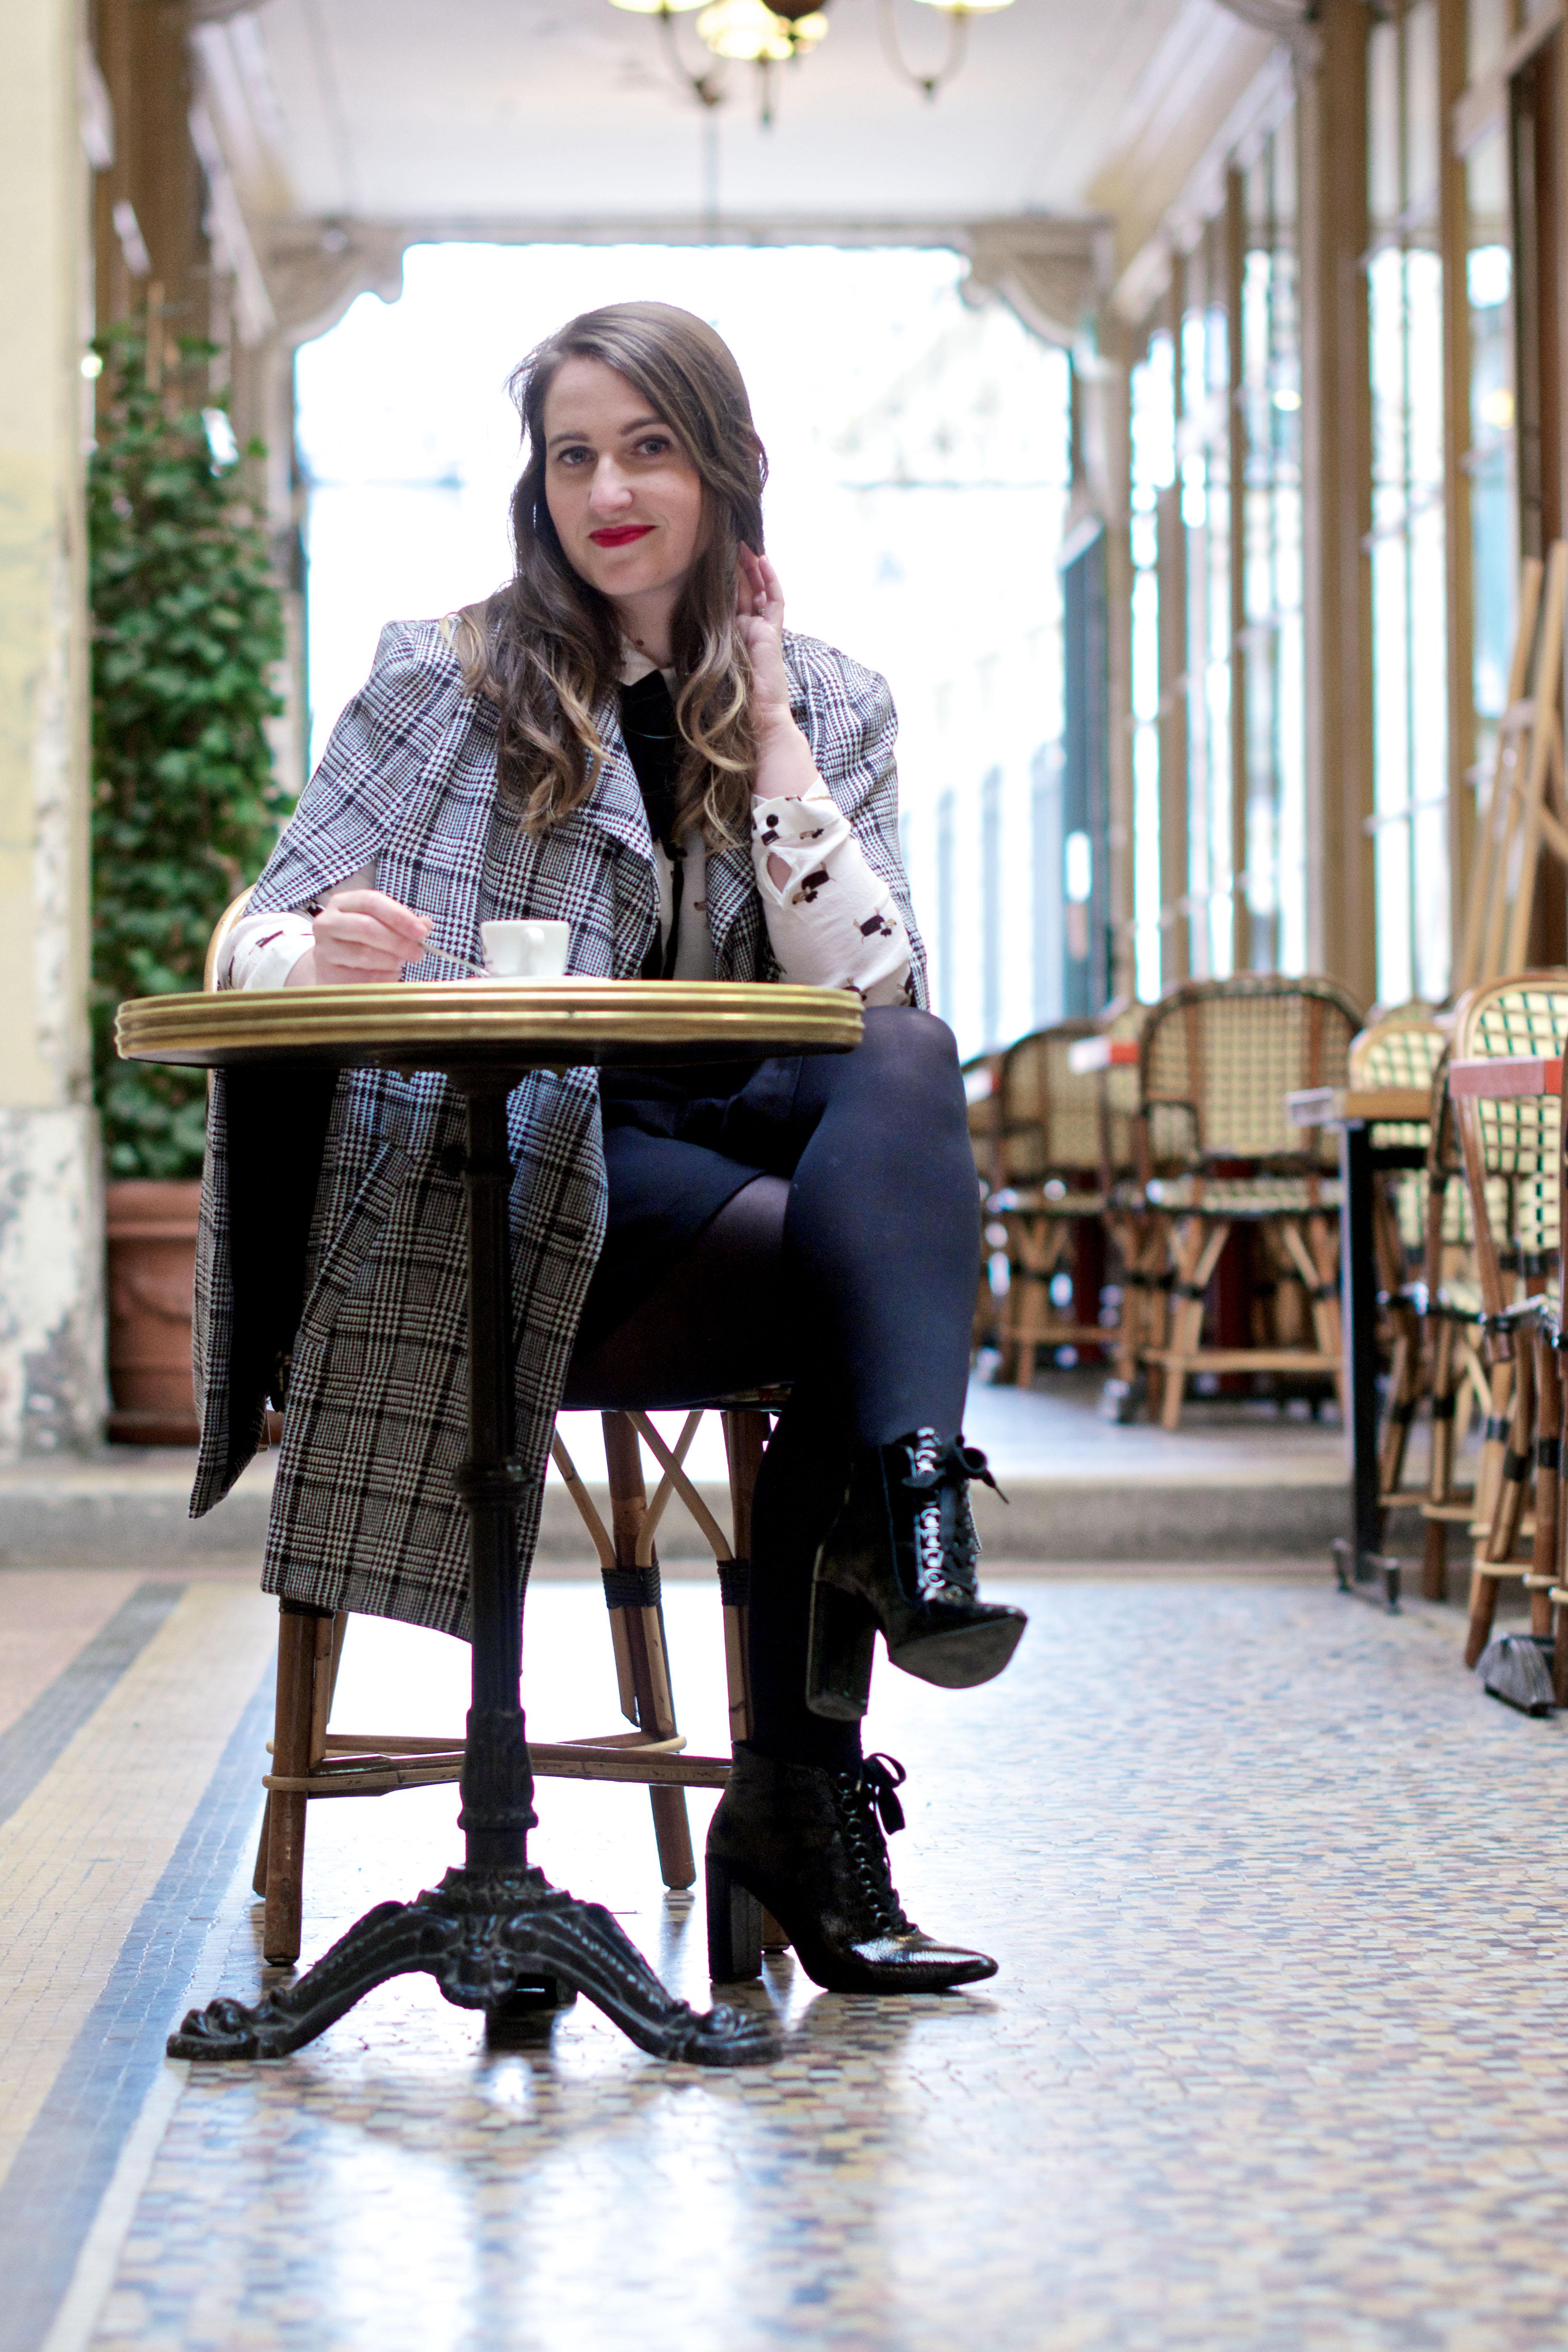 look-preppy-london-capetartan-shein-galeriesvivienne-paris-influencer-fashionblogger-chemiseretro-mango-jupepatineuse-bottineszara-vinyl-seralynepointcom_DSC3466